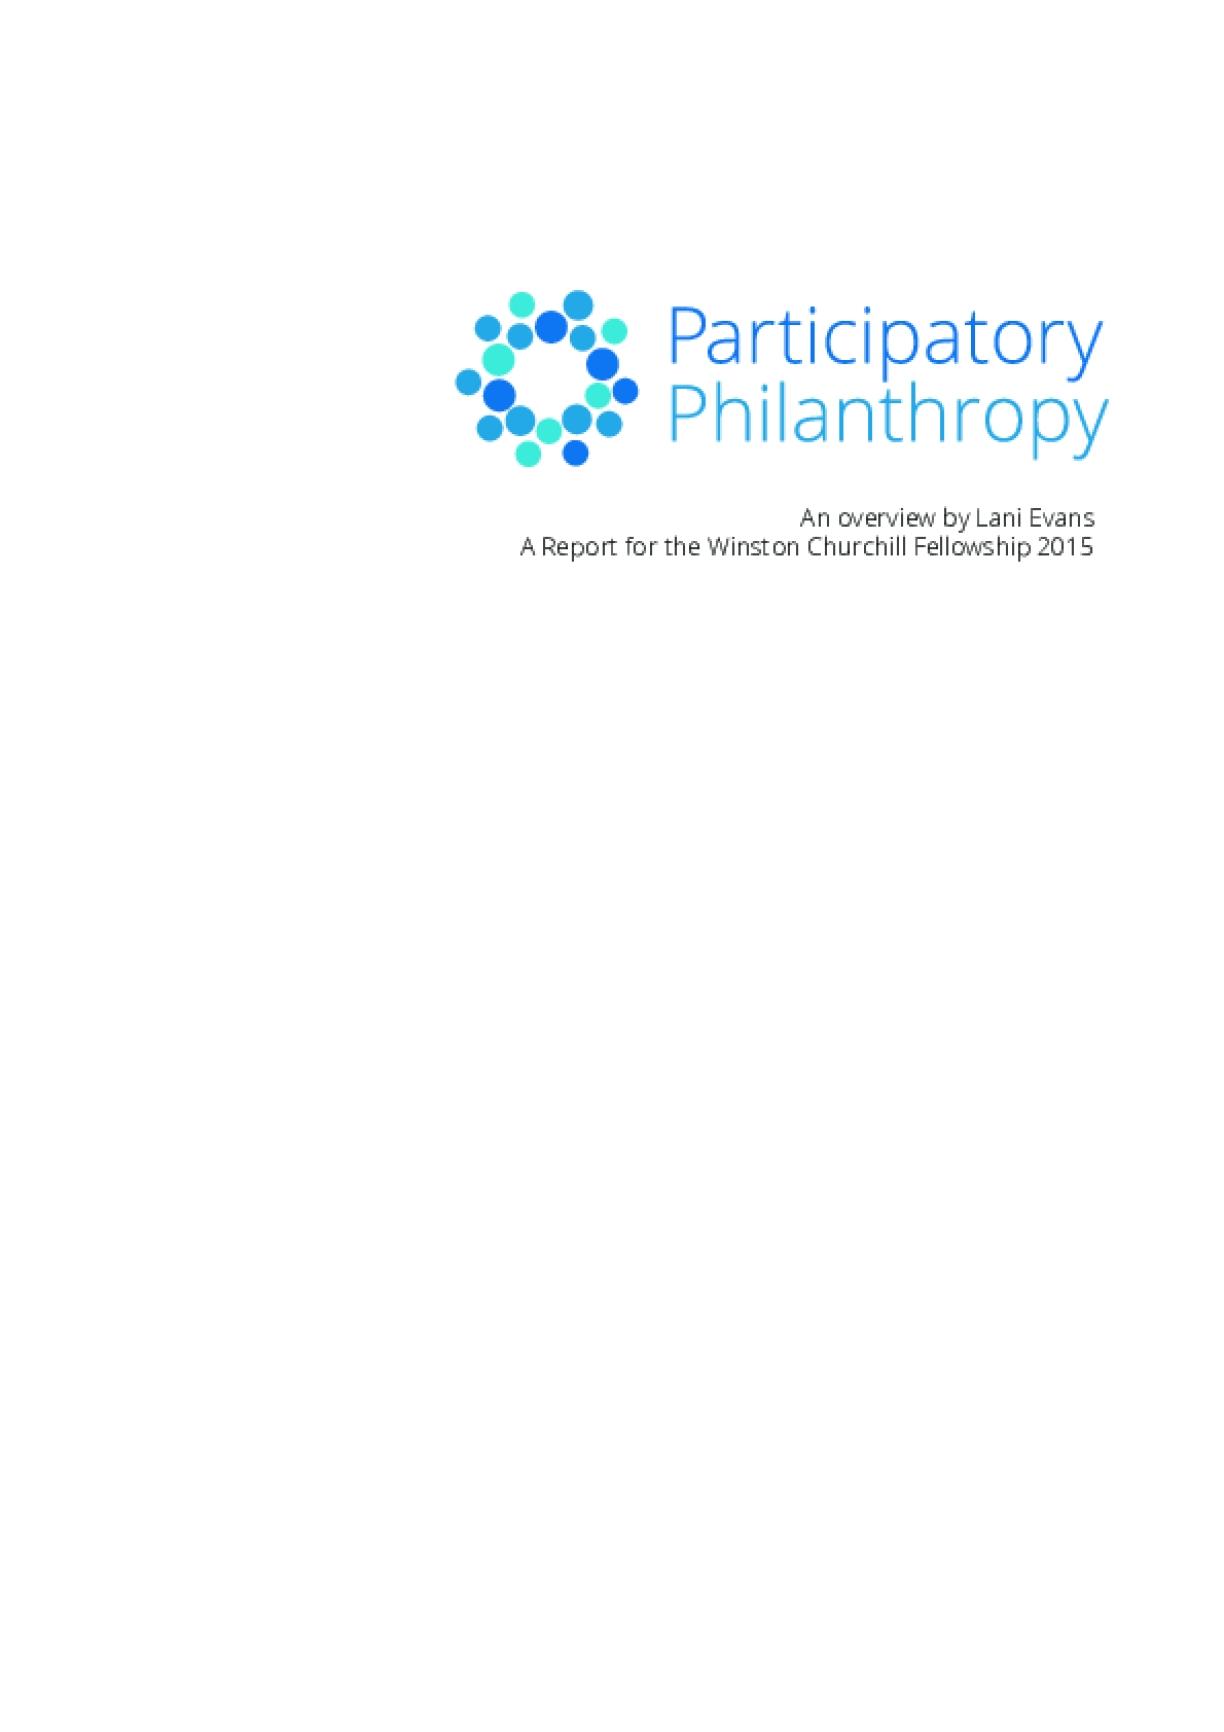 Participatory Philanthropy